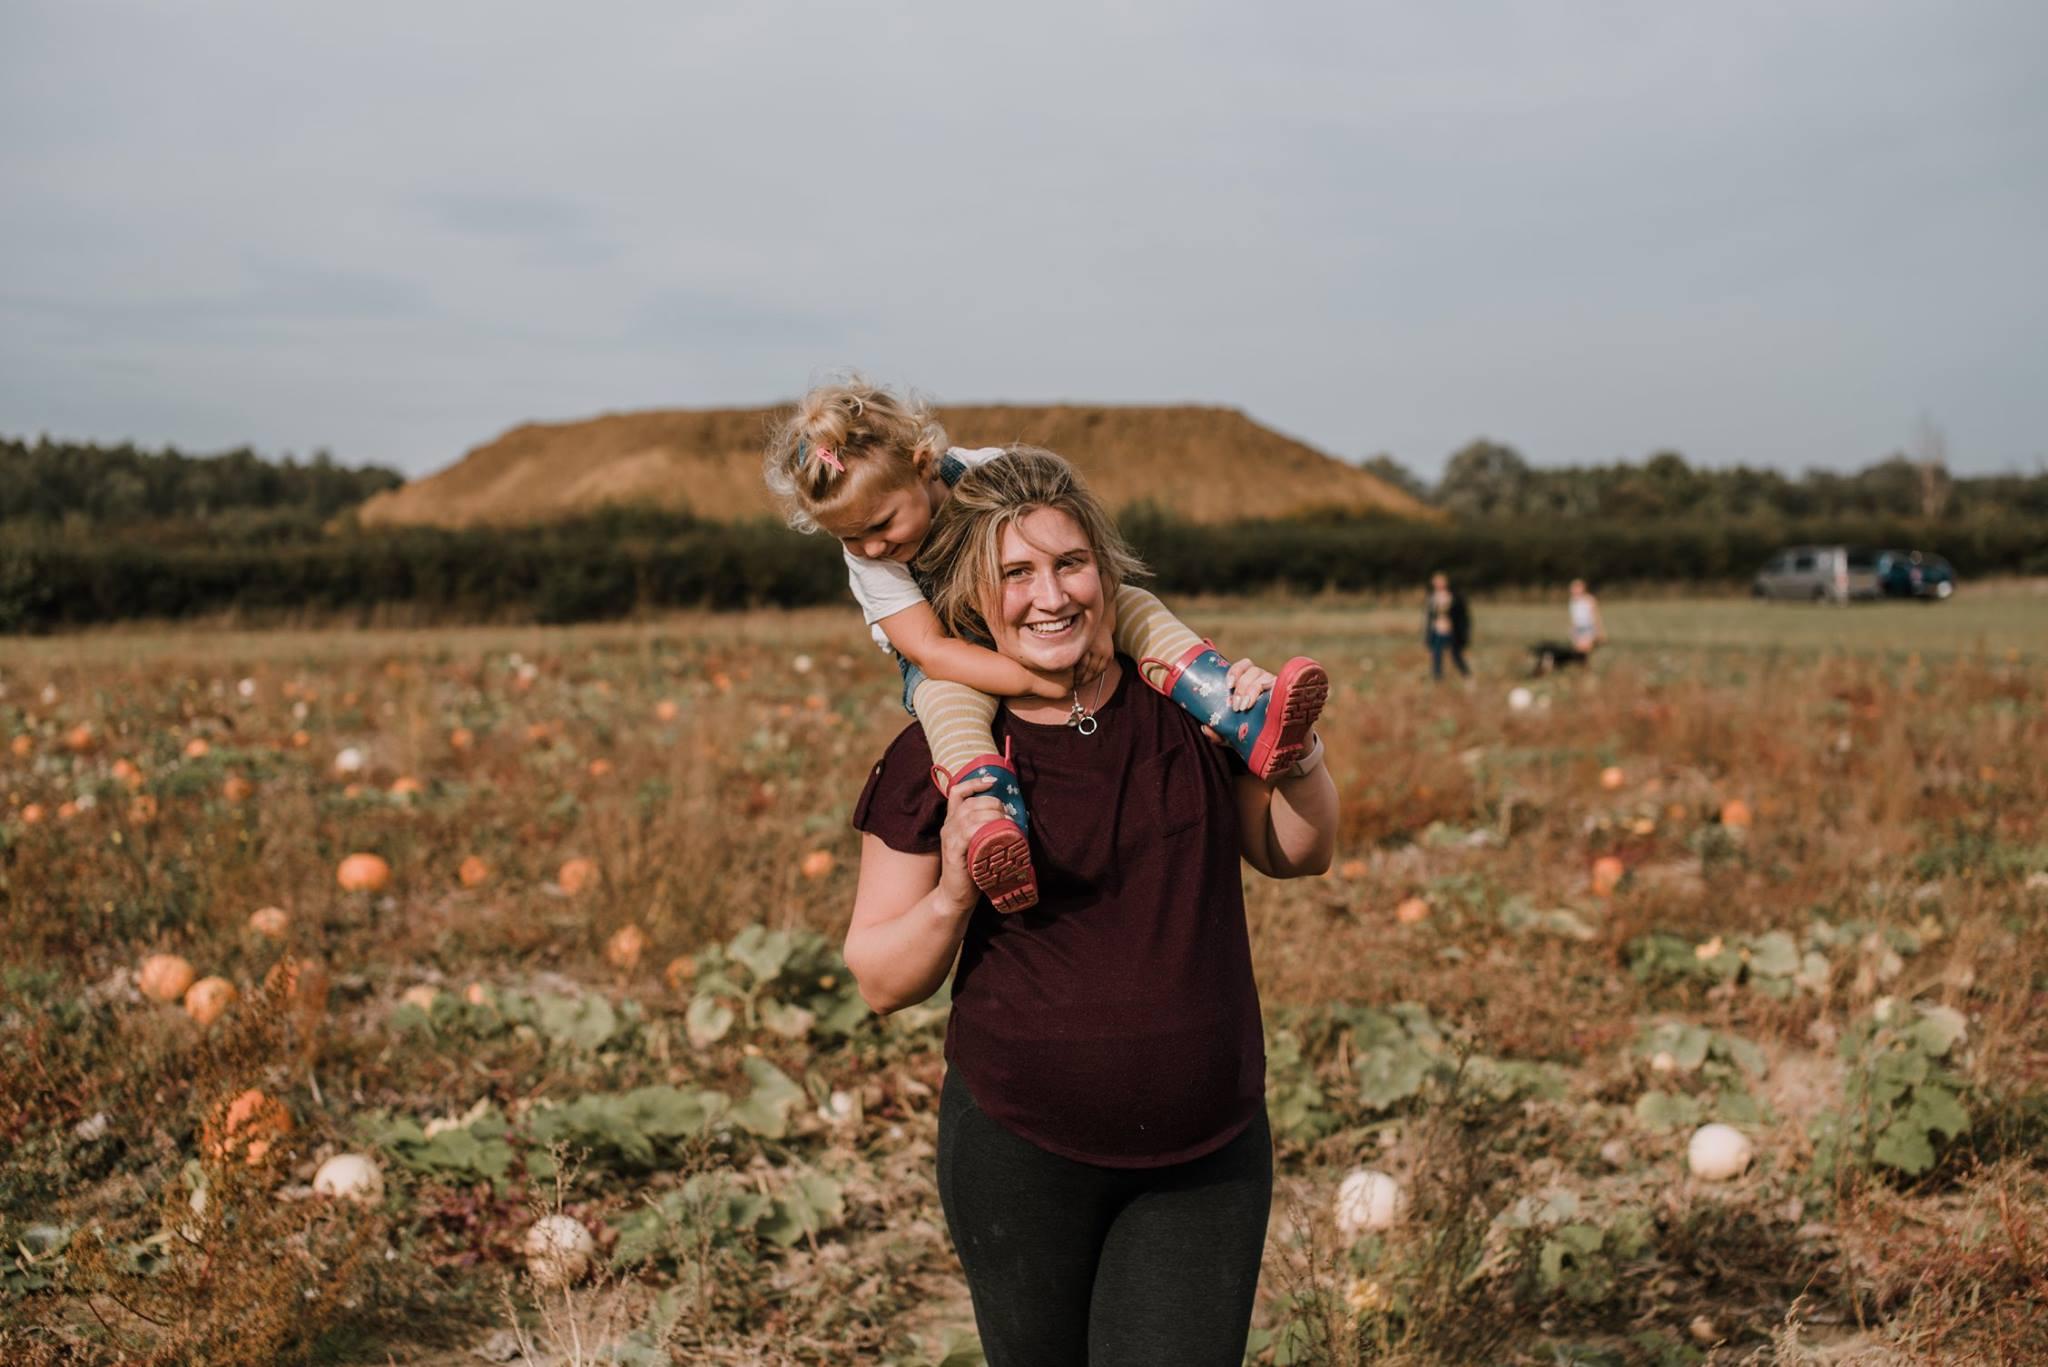 Dougal photography, newborn photography, pumpkin patch photography, family photography ,